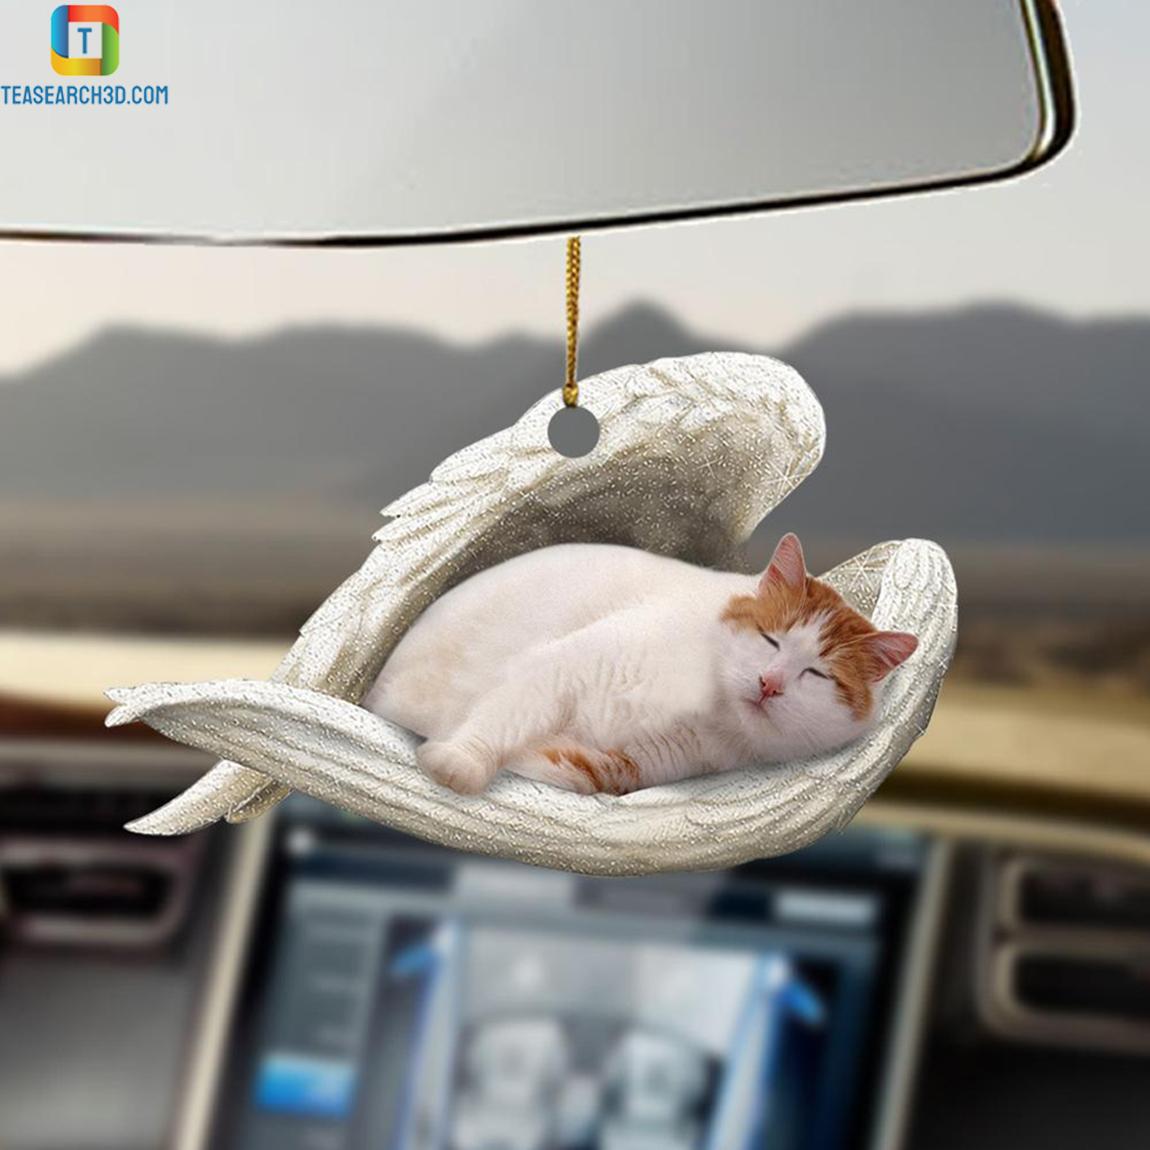 Turkish Van sleeping angel car hanging ornament 1